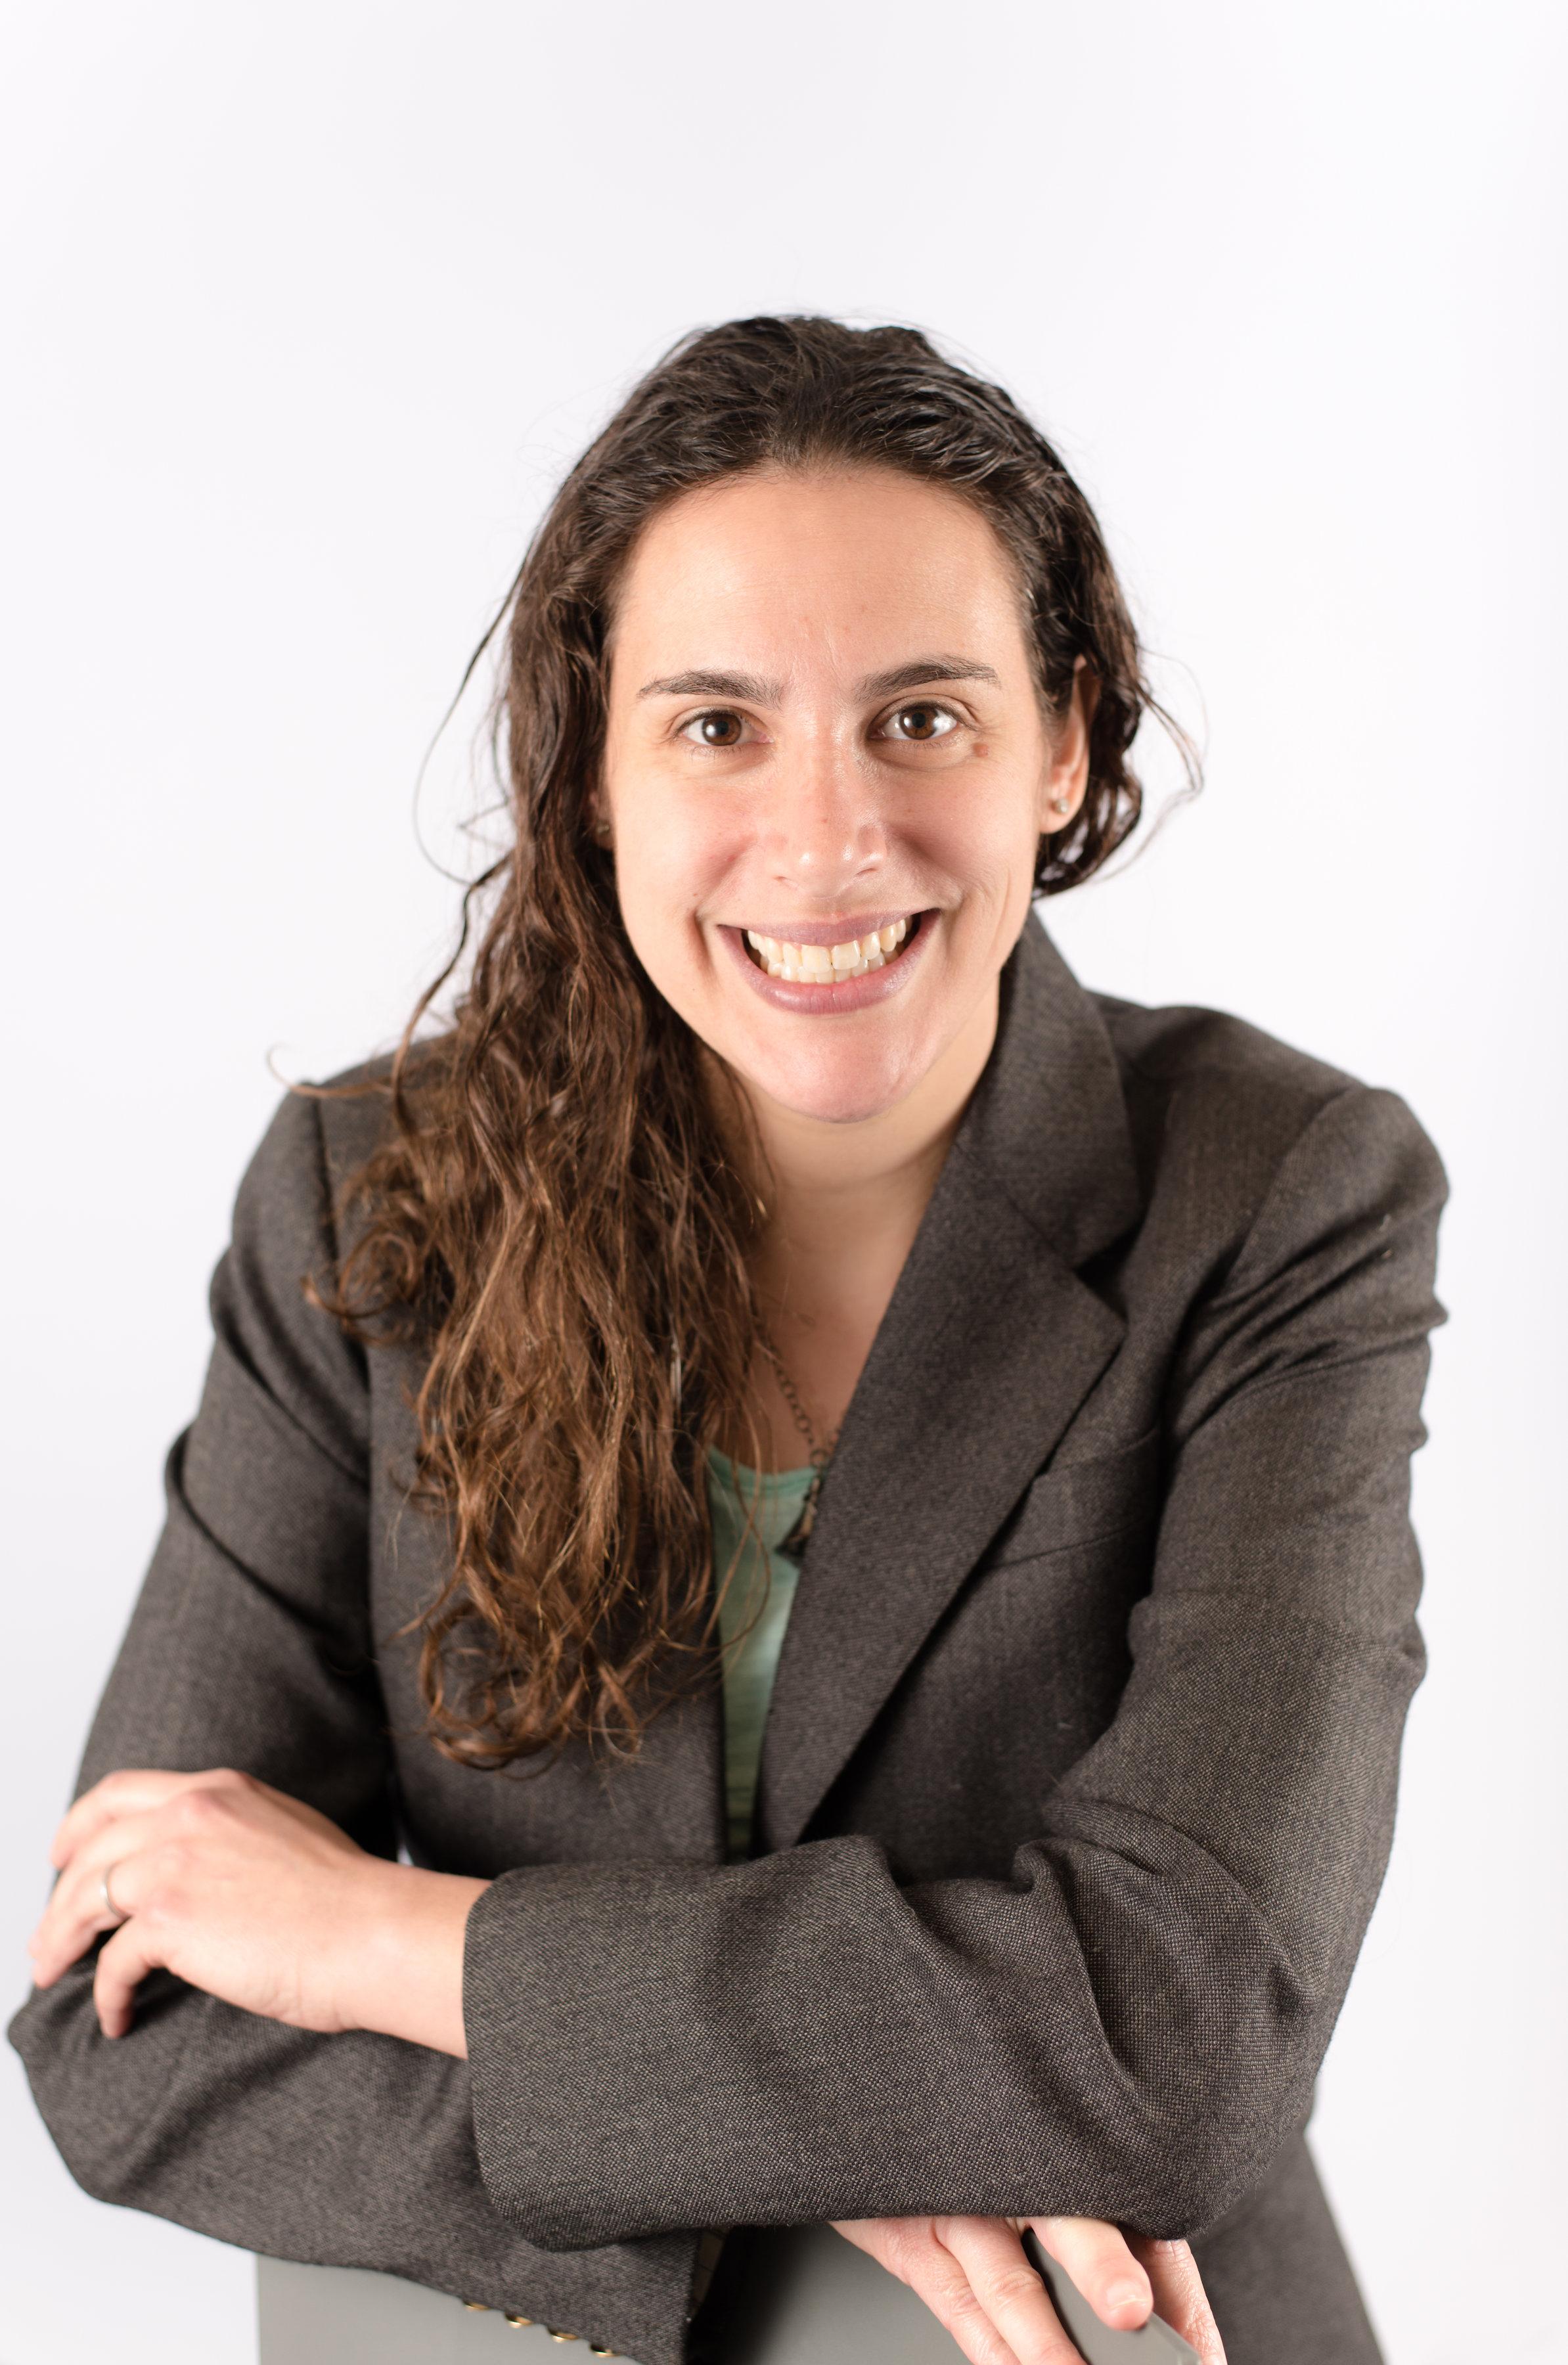 Nikki Usher, profesora de la Universidad de Illinois (Foto: Shala W. Graham, Shala Photography)